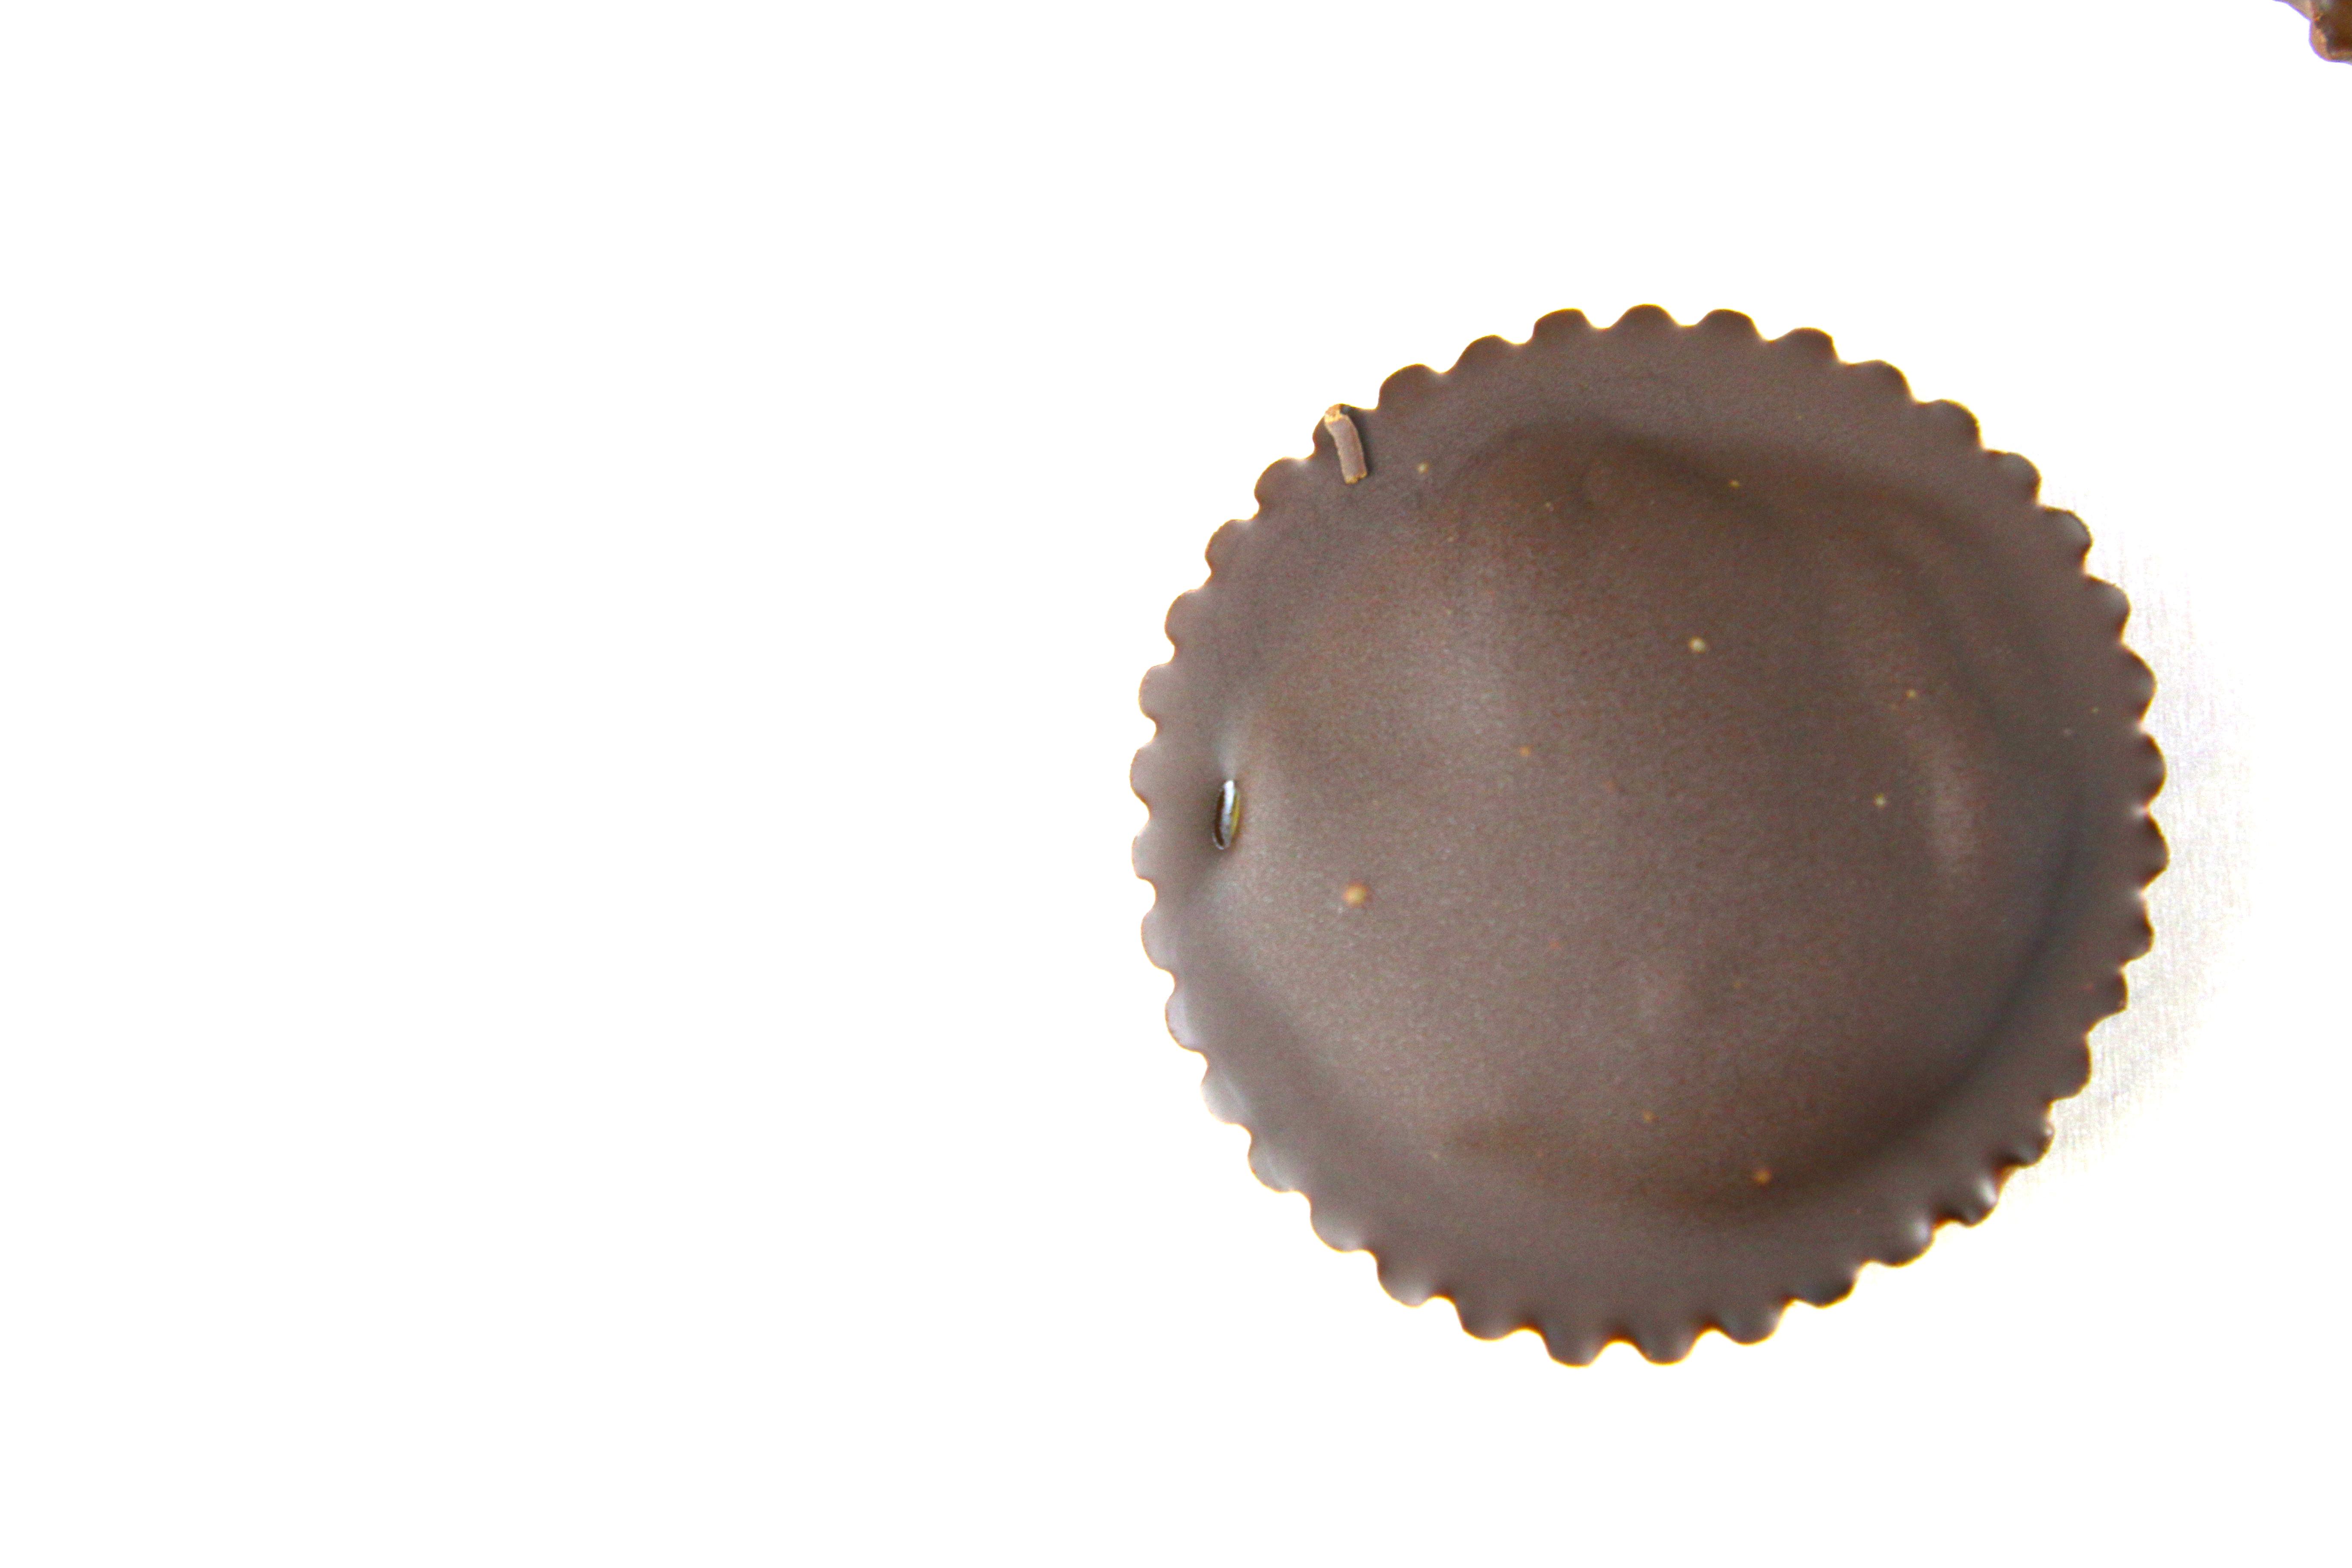 Vegan Chocolate Peanut Butter Cups | Homemade Reese's